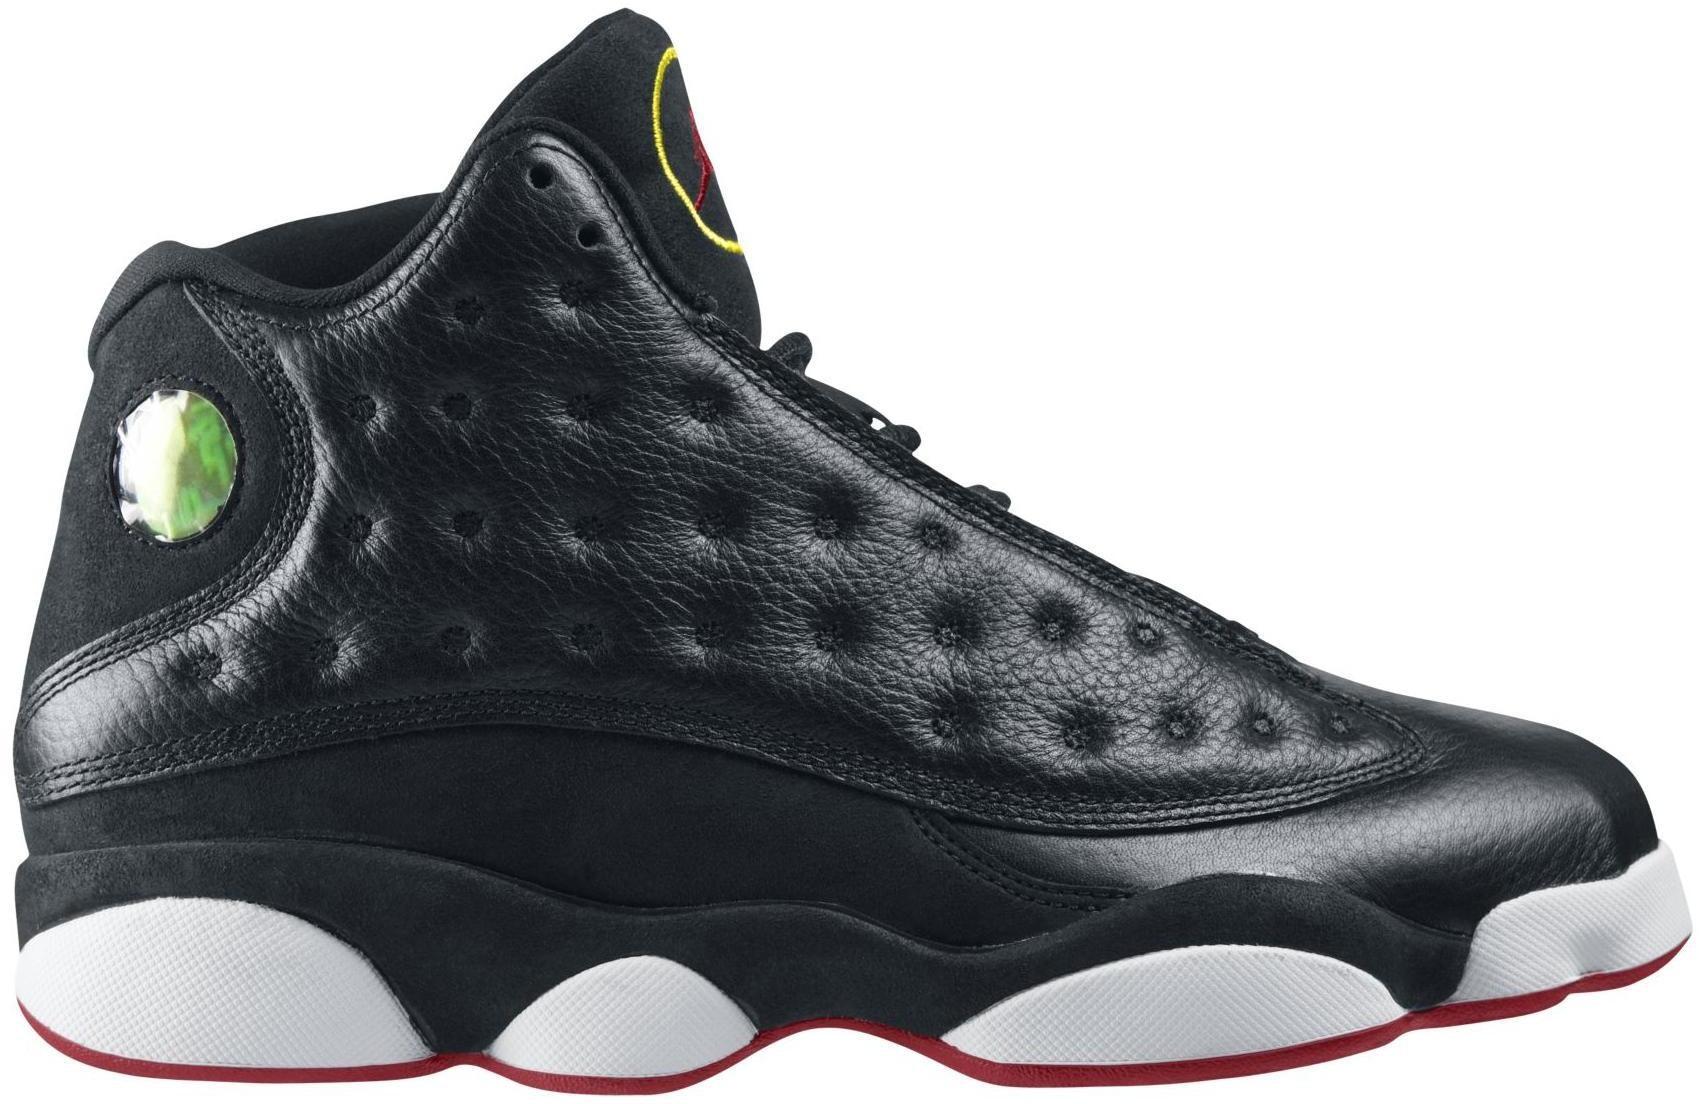 Jordan 13 Retro Playoffs (2011)